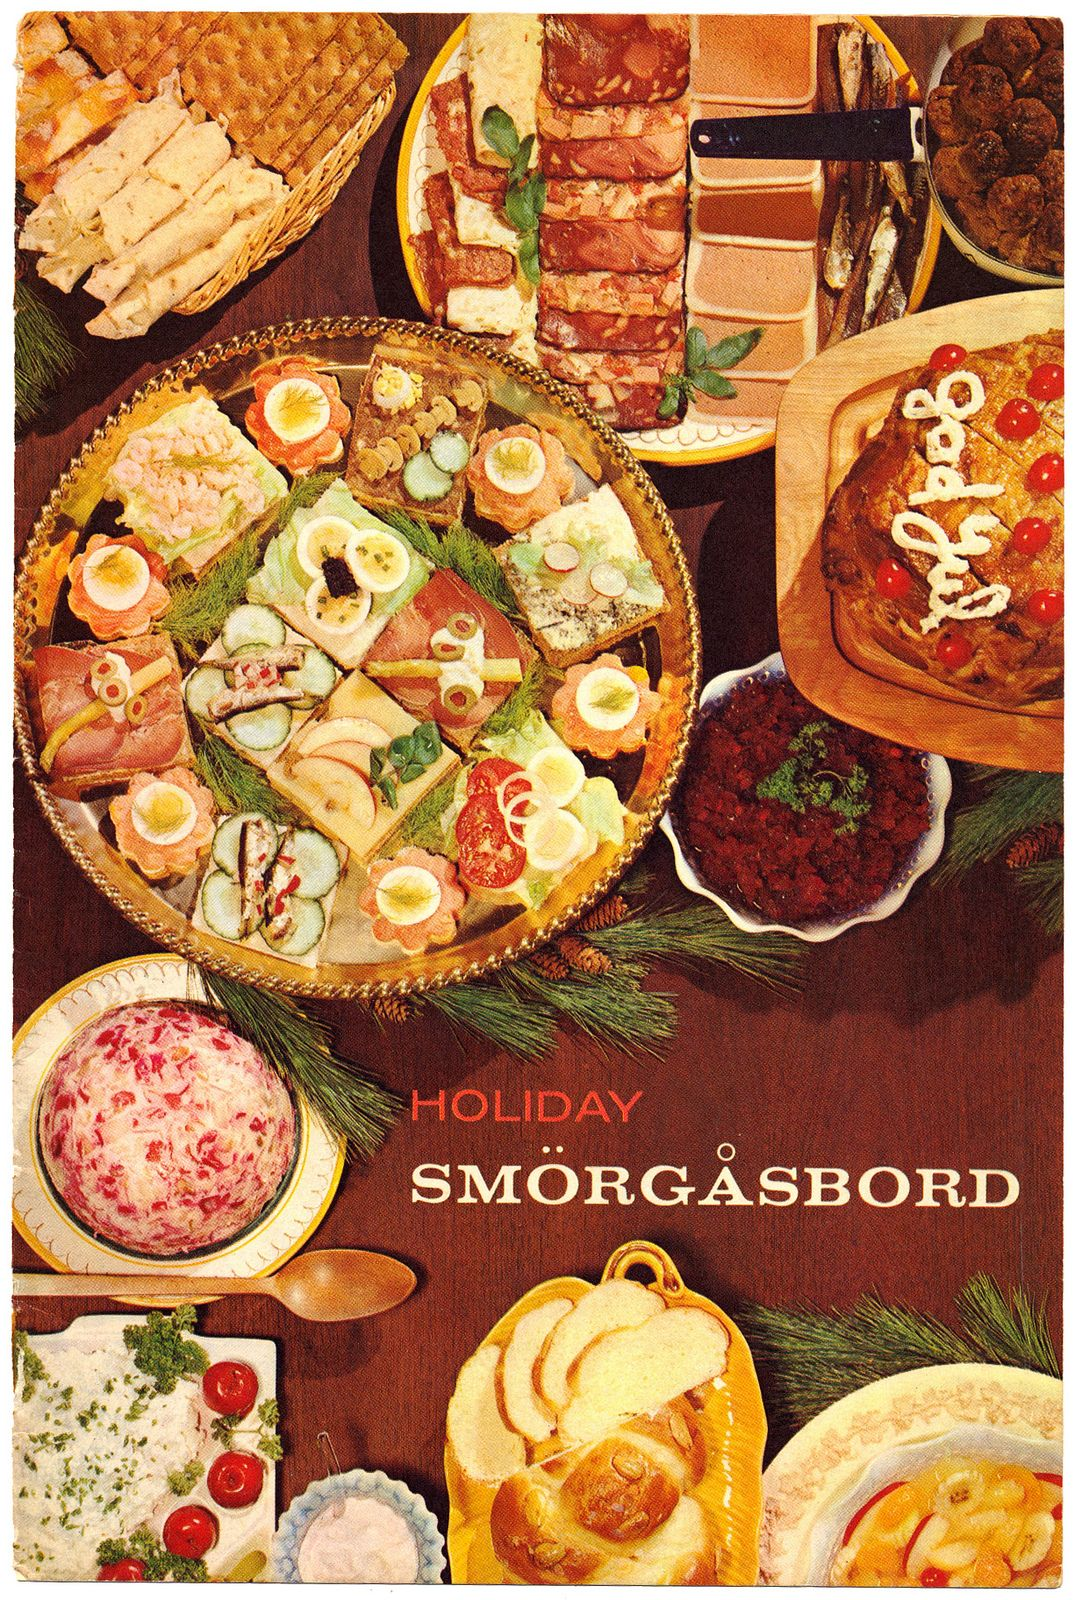 Holiday Smorgasbord 1960 Page 00 Scandinavian Food Holiday Entertaining Food Swedish Recipes